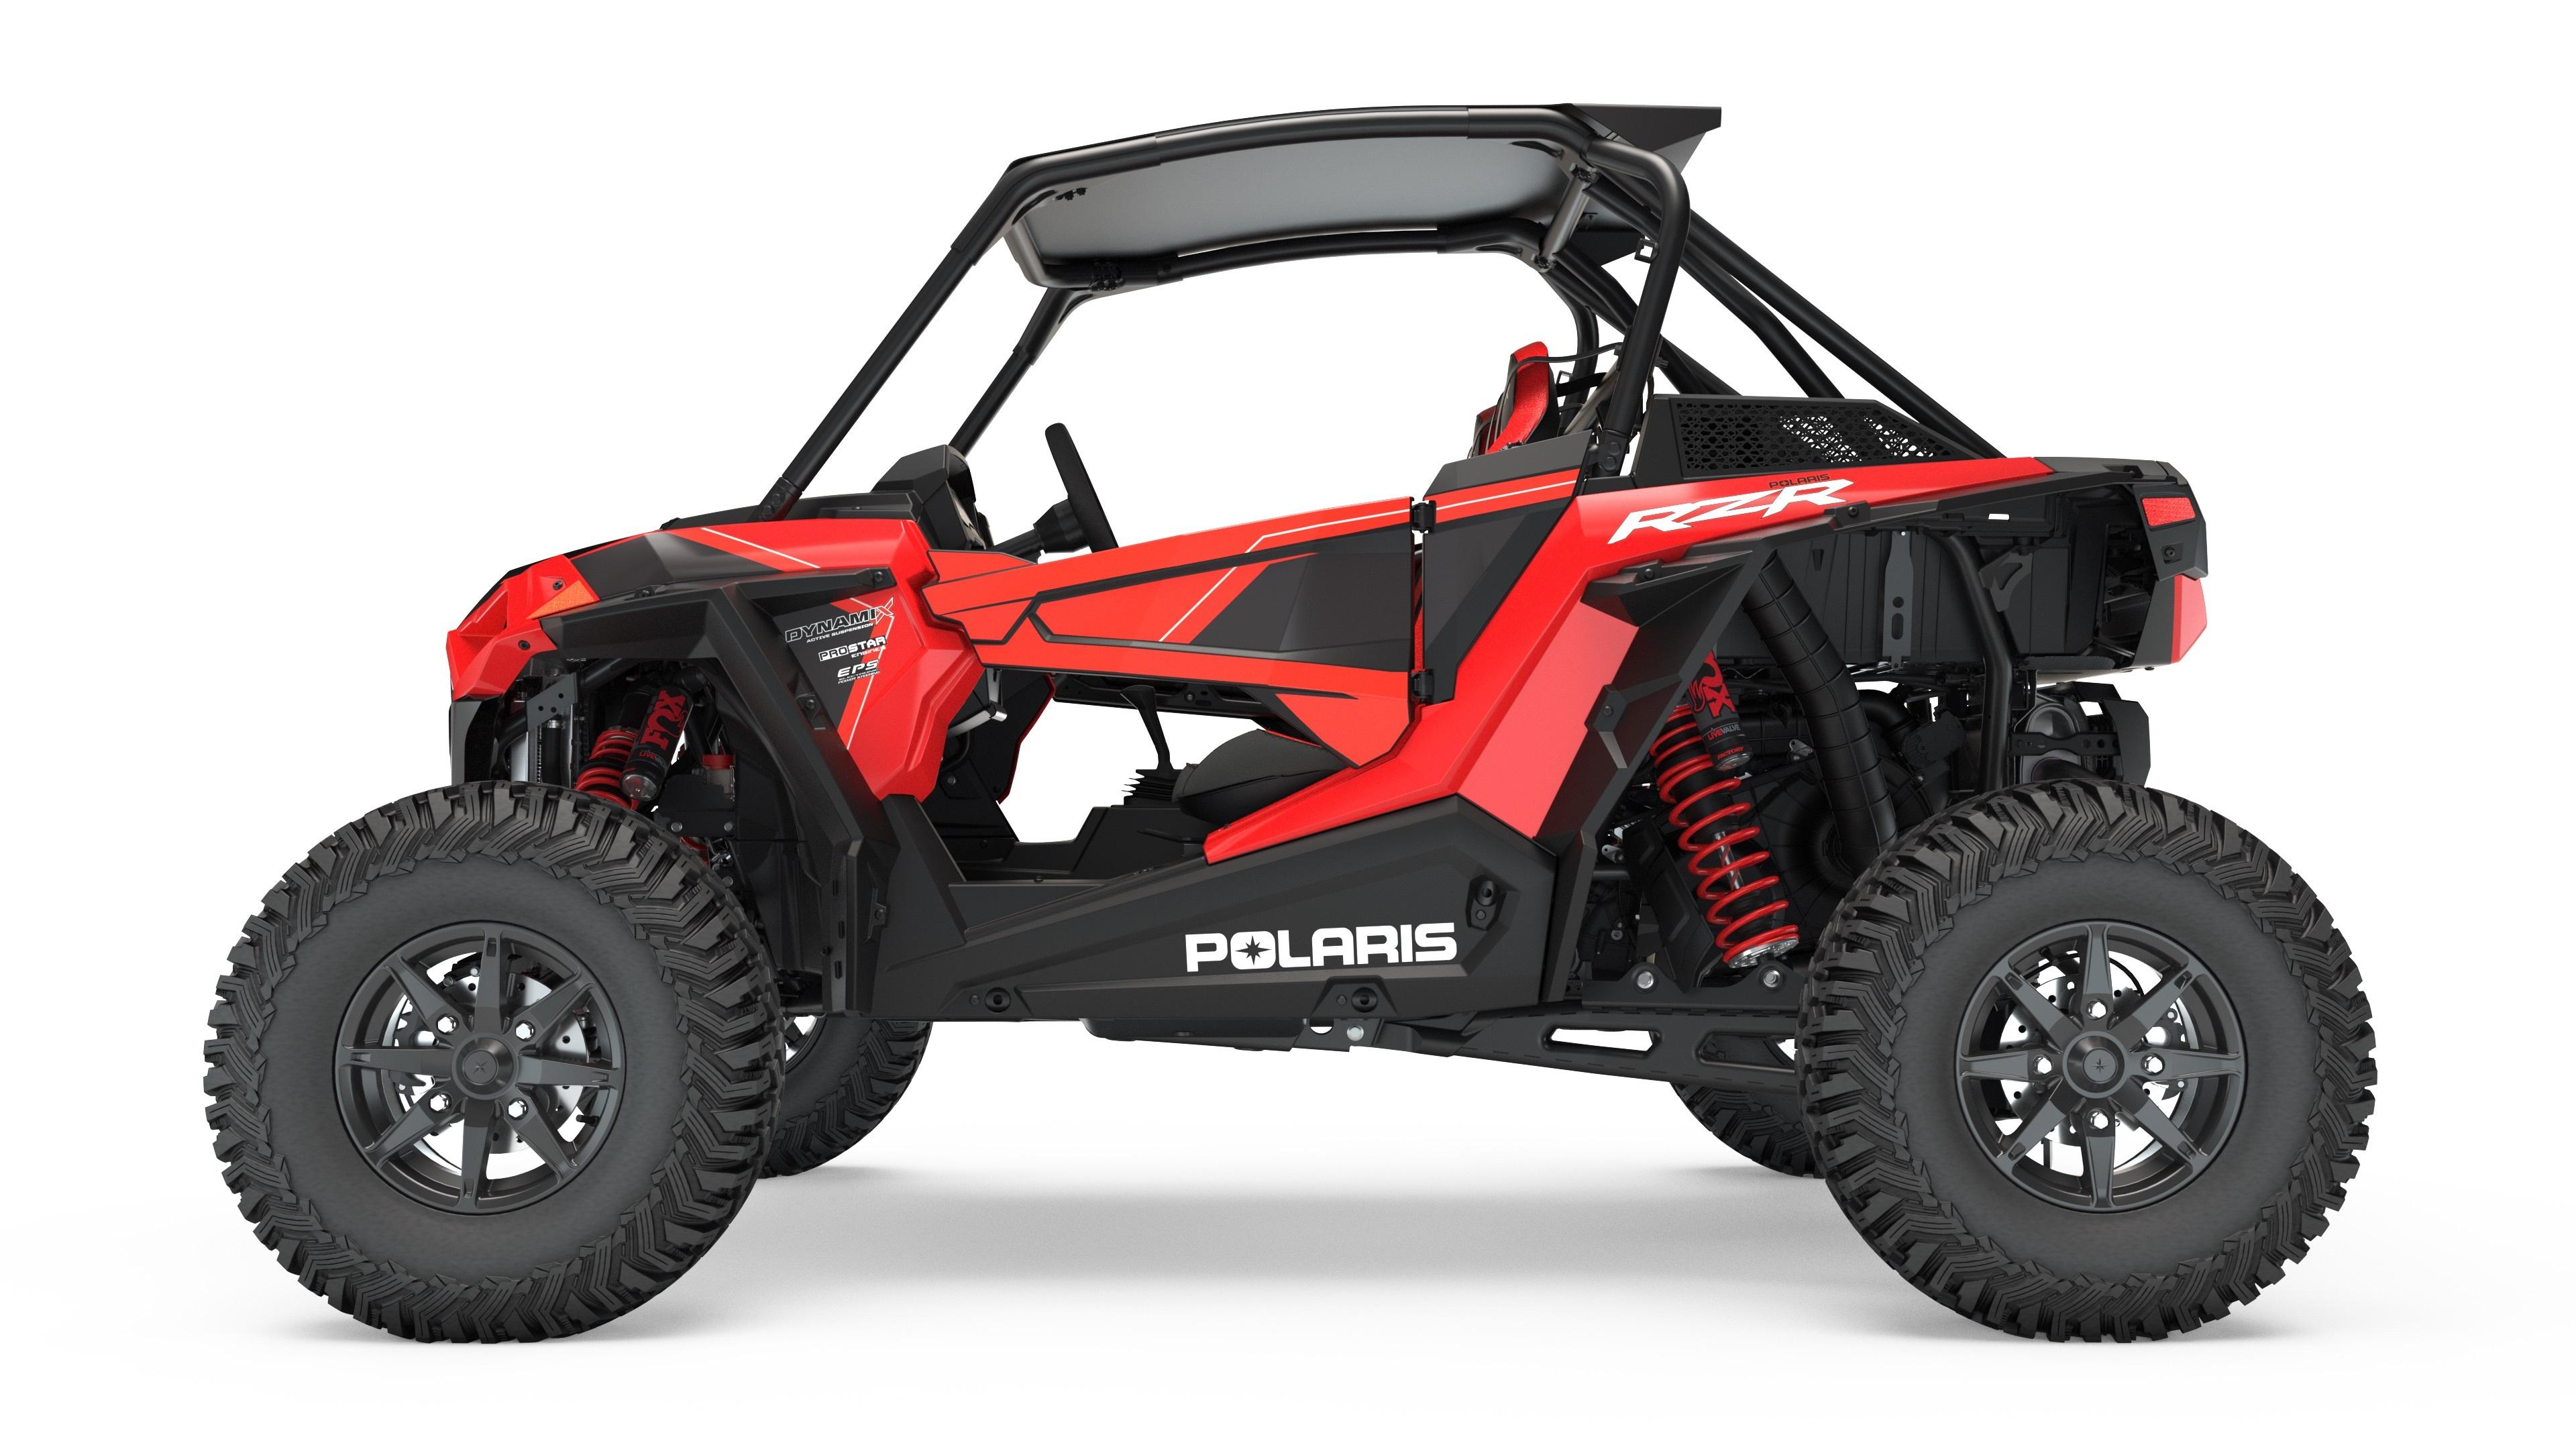 2018 Polaris Rzr Turbo >> The 72-Inch Polaris RZR Is Here, Introducing the RZR XP Turbo S